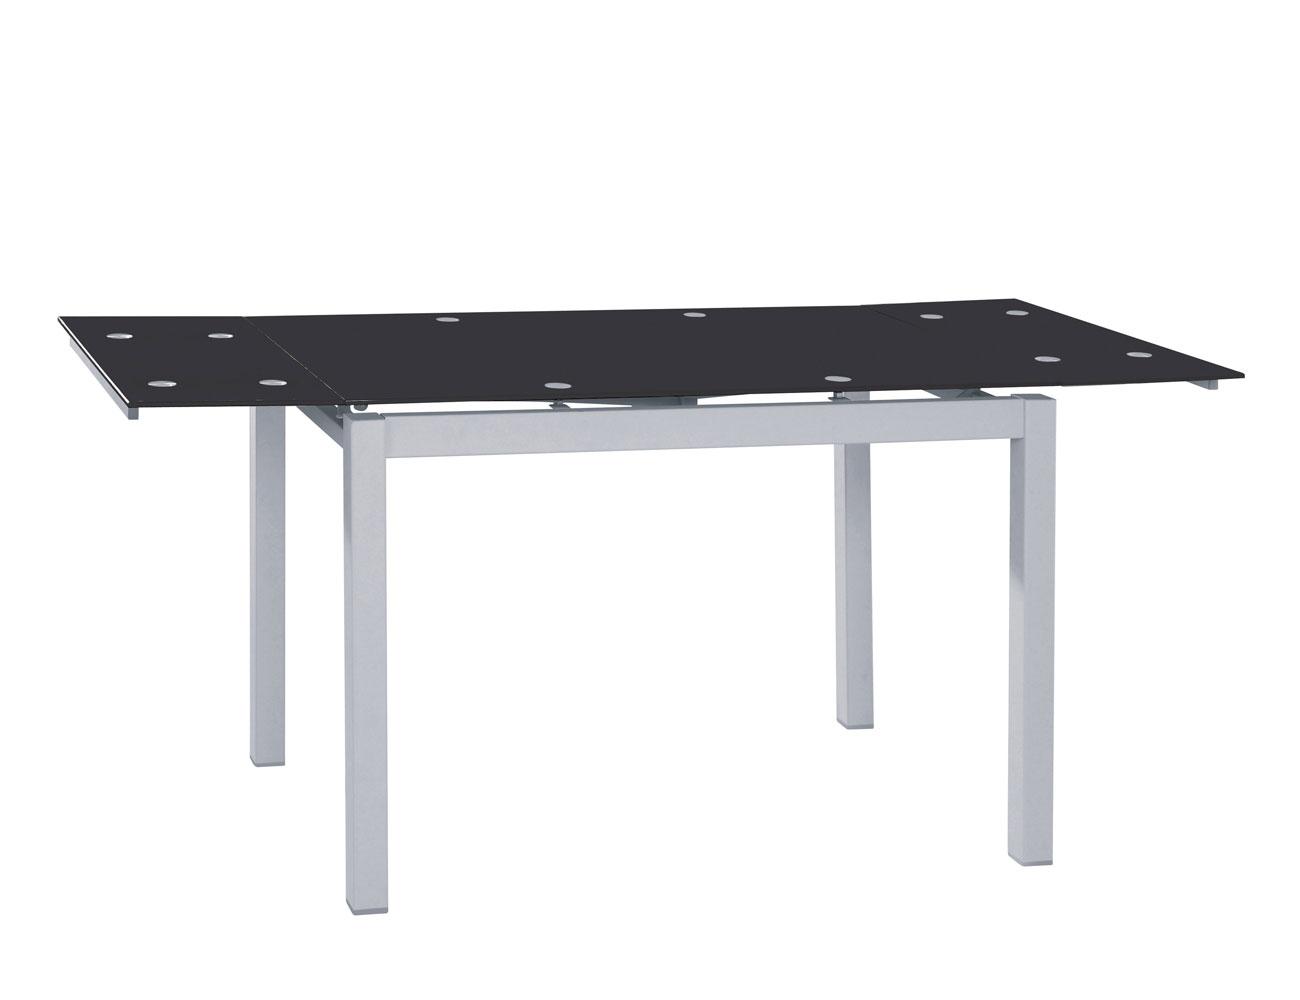 Mesa de cocina extensible en cristal templado 3582 for Mesa comedor cristal negro